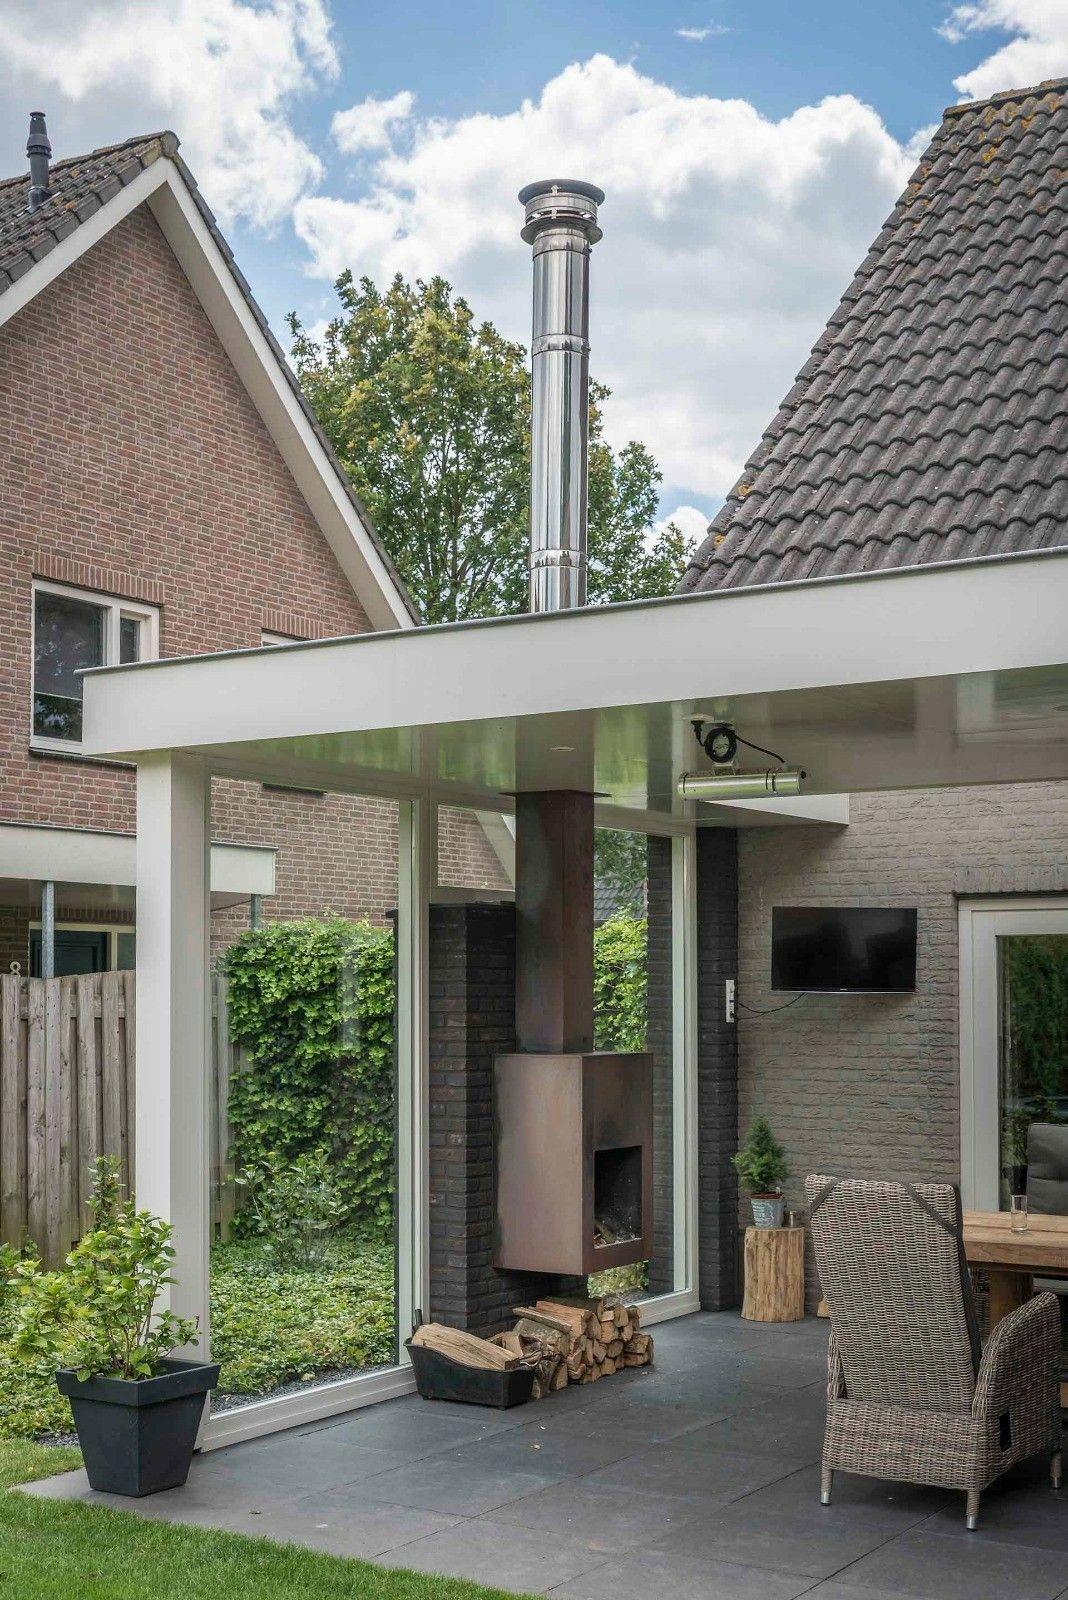 Moderne overkapping met zijwand glas tuin serre for Moderne tuin met overkapping